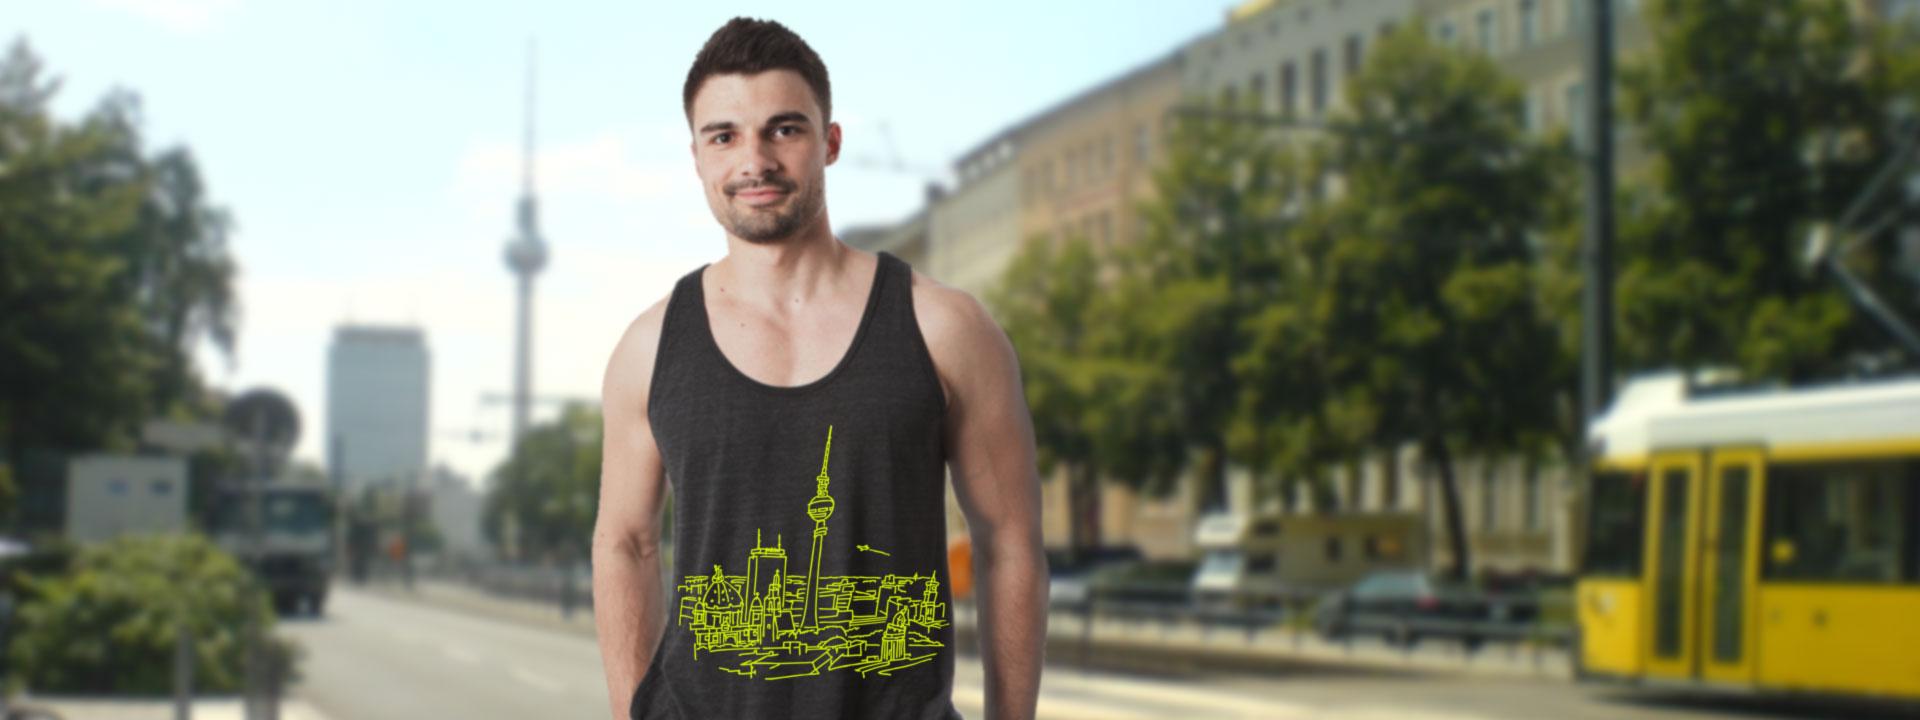 BERLIN Panorma, Tanktop, Berlin-T-shirt